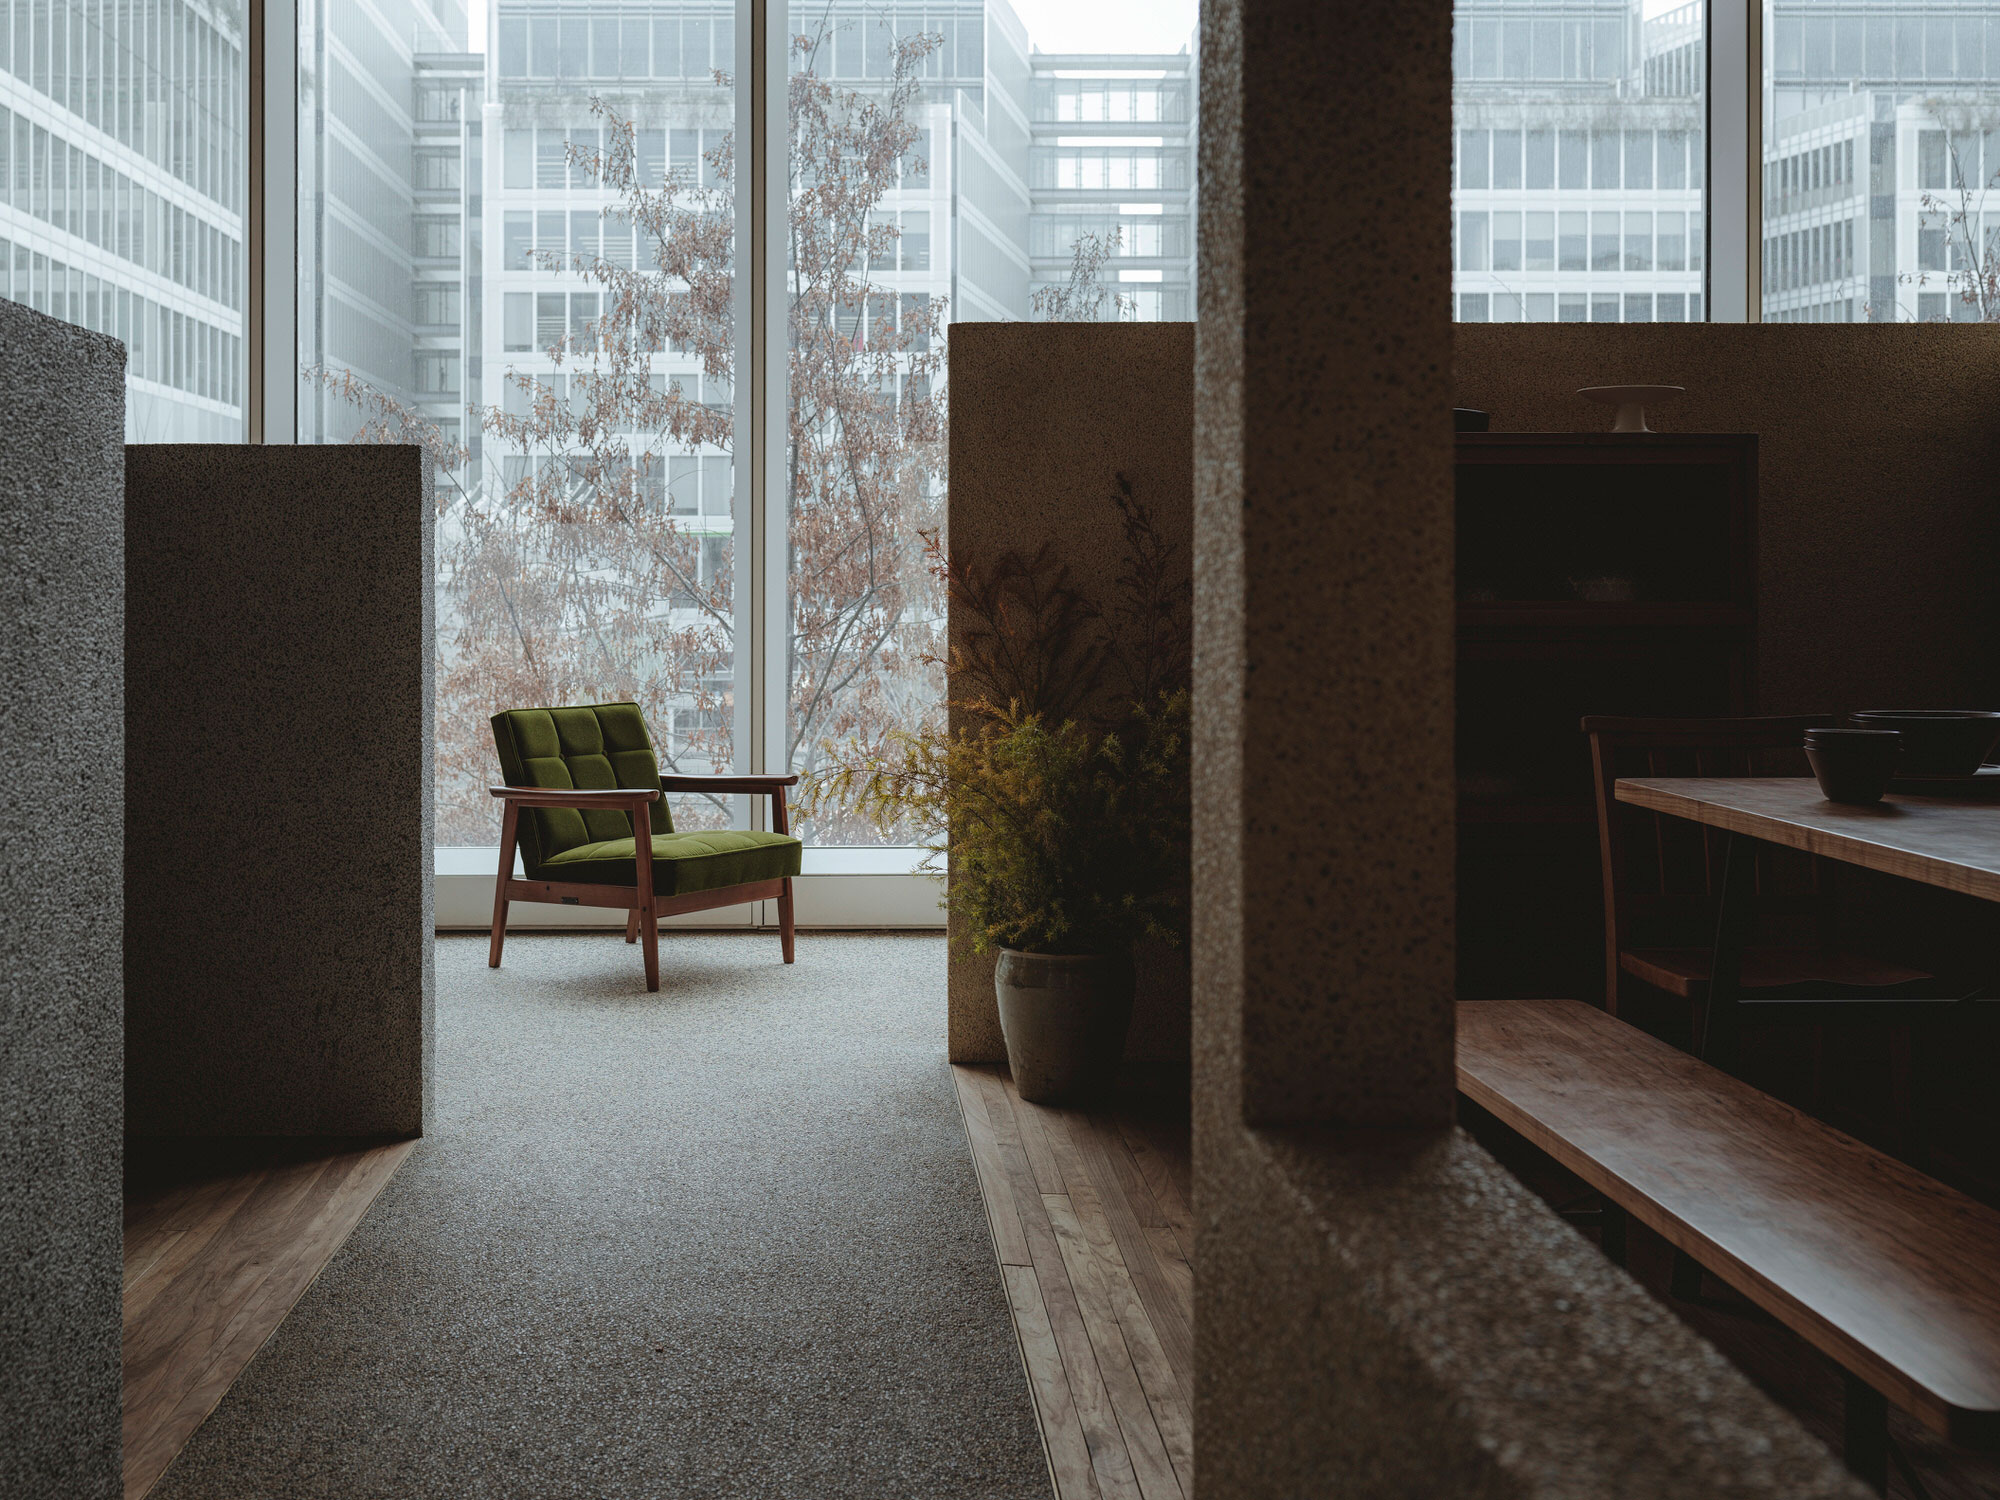 Blue Architecture Studio Lost Found Hangzhou Photo Tantan Lei Yellowtrace 33